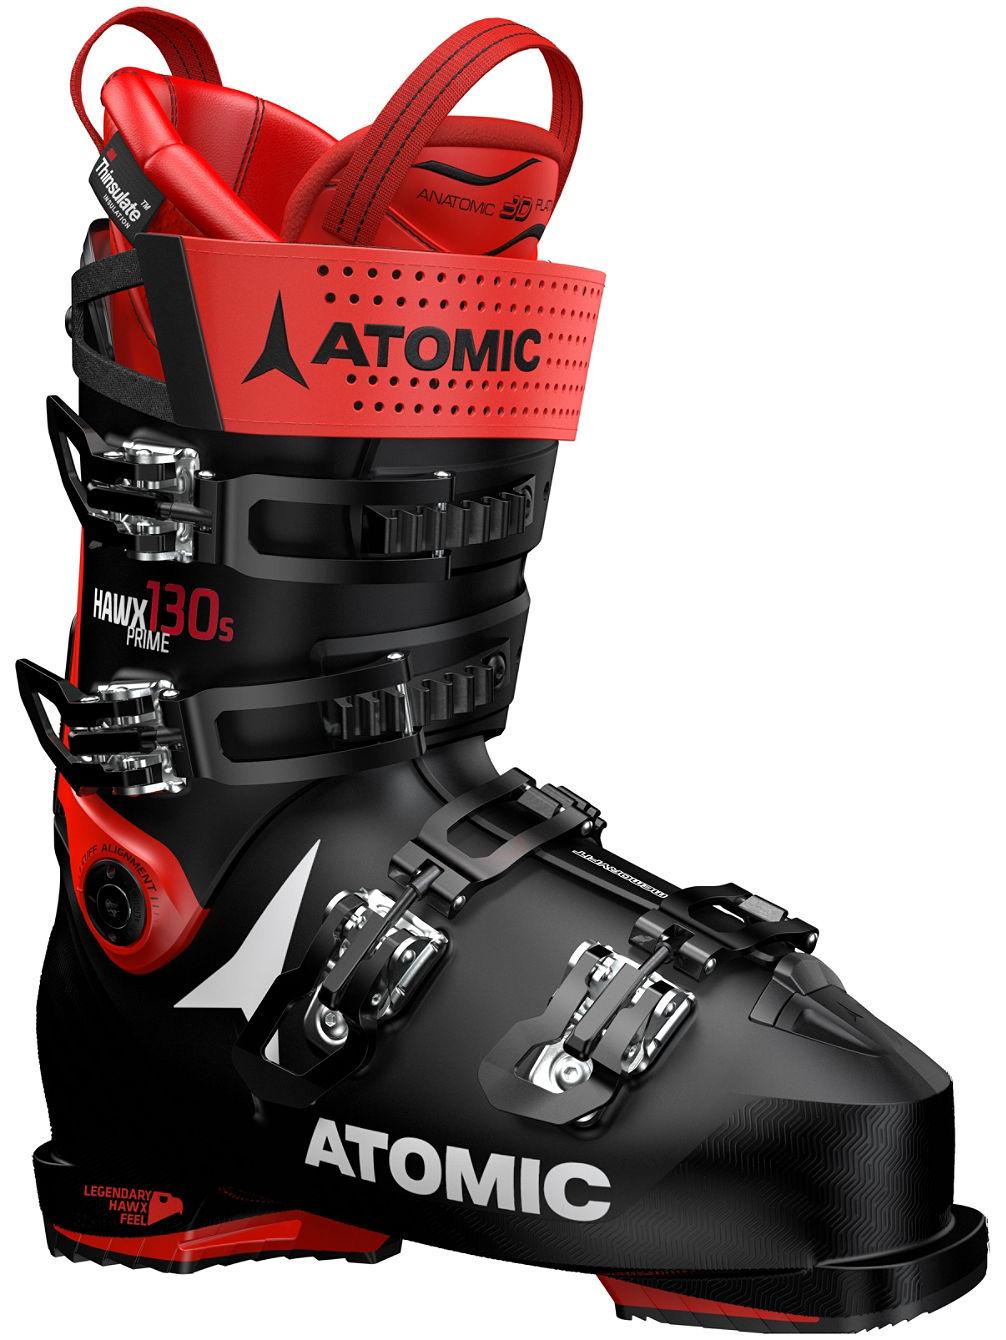 43fcdd136f7 Atomic Hawx Prime 130 S 2019 Skischoenen online kopen bij Blue Tomato